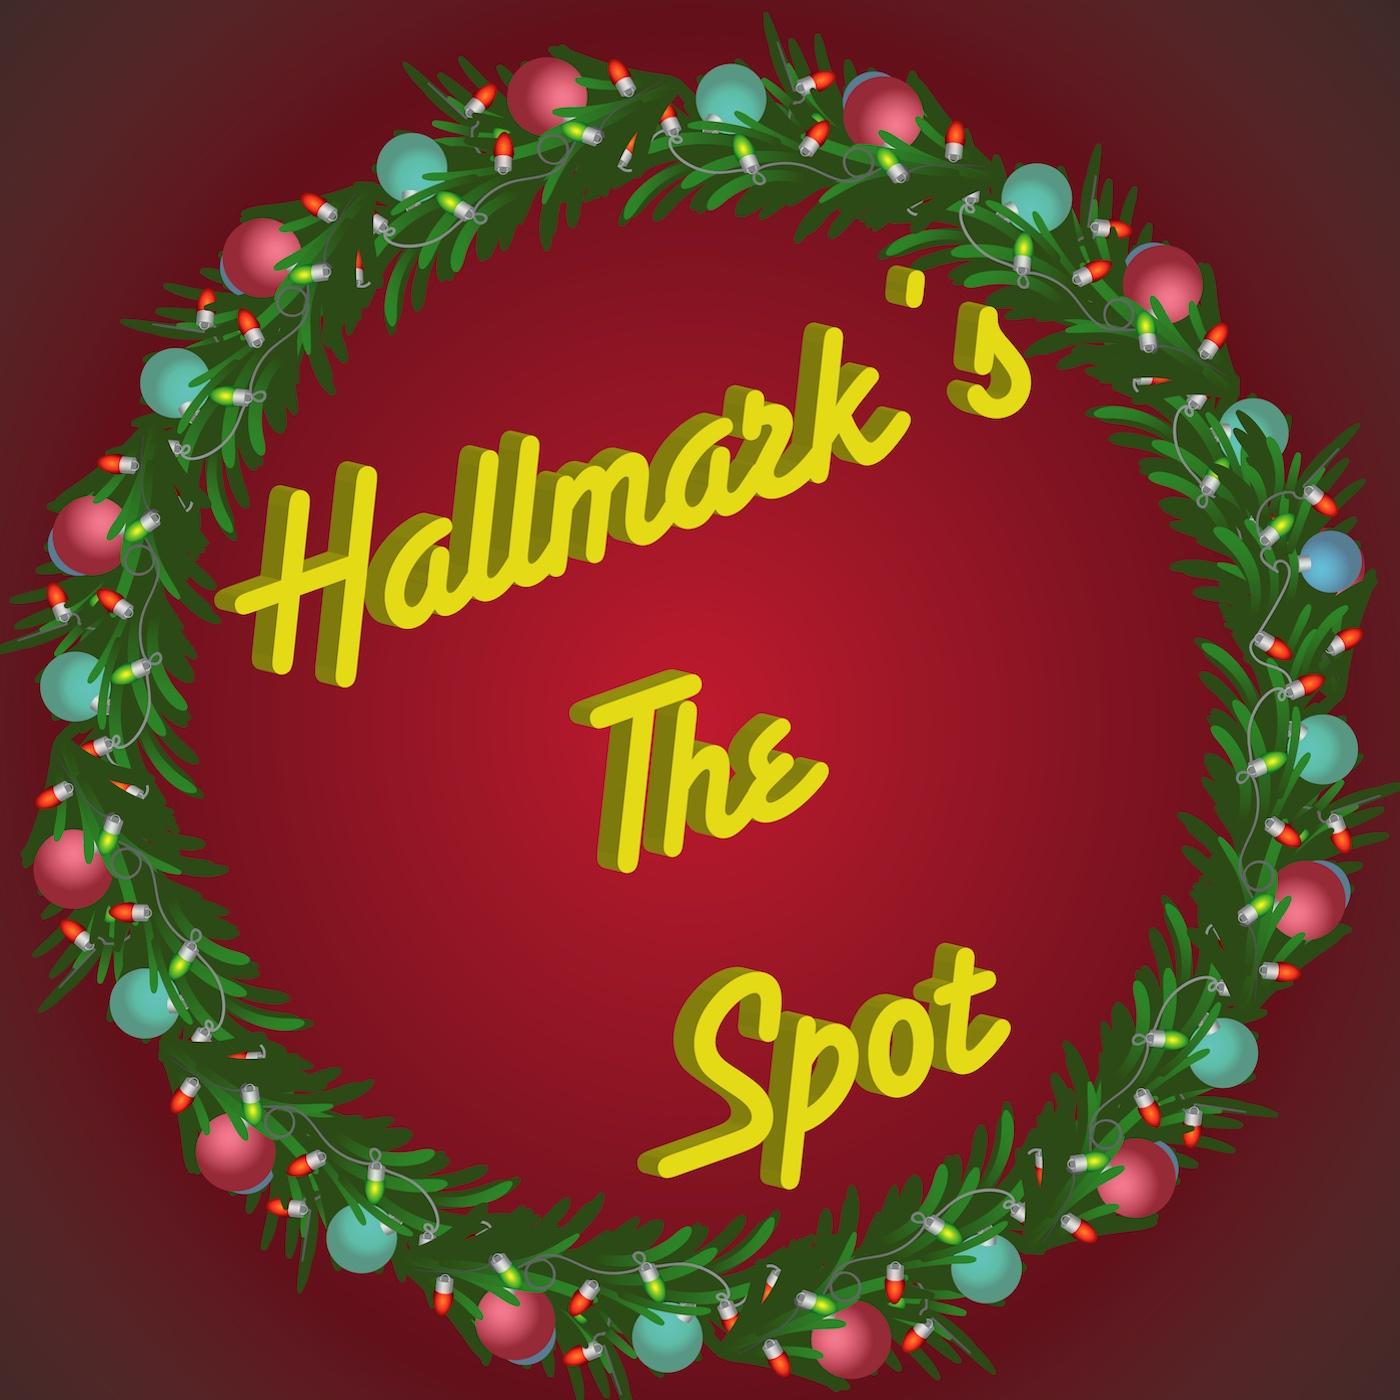 Show artwork for Hallmarks The Spot